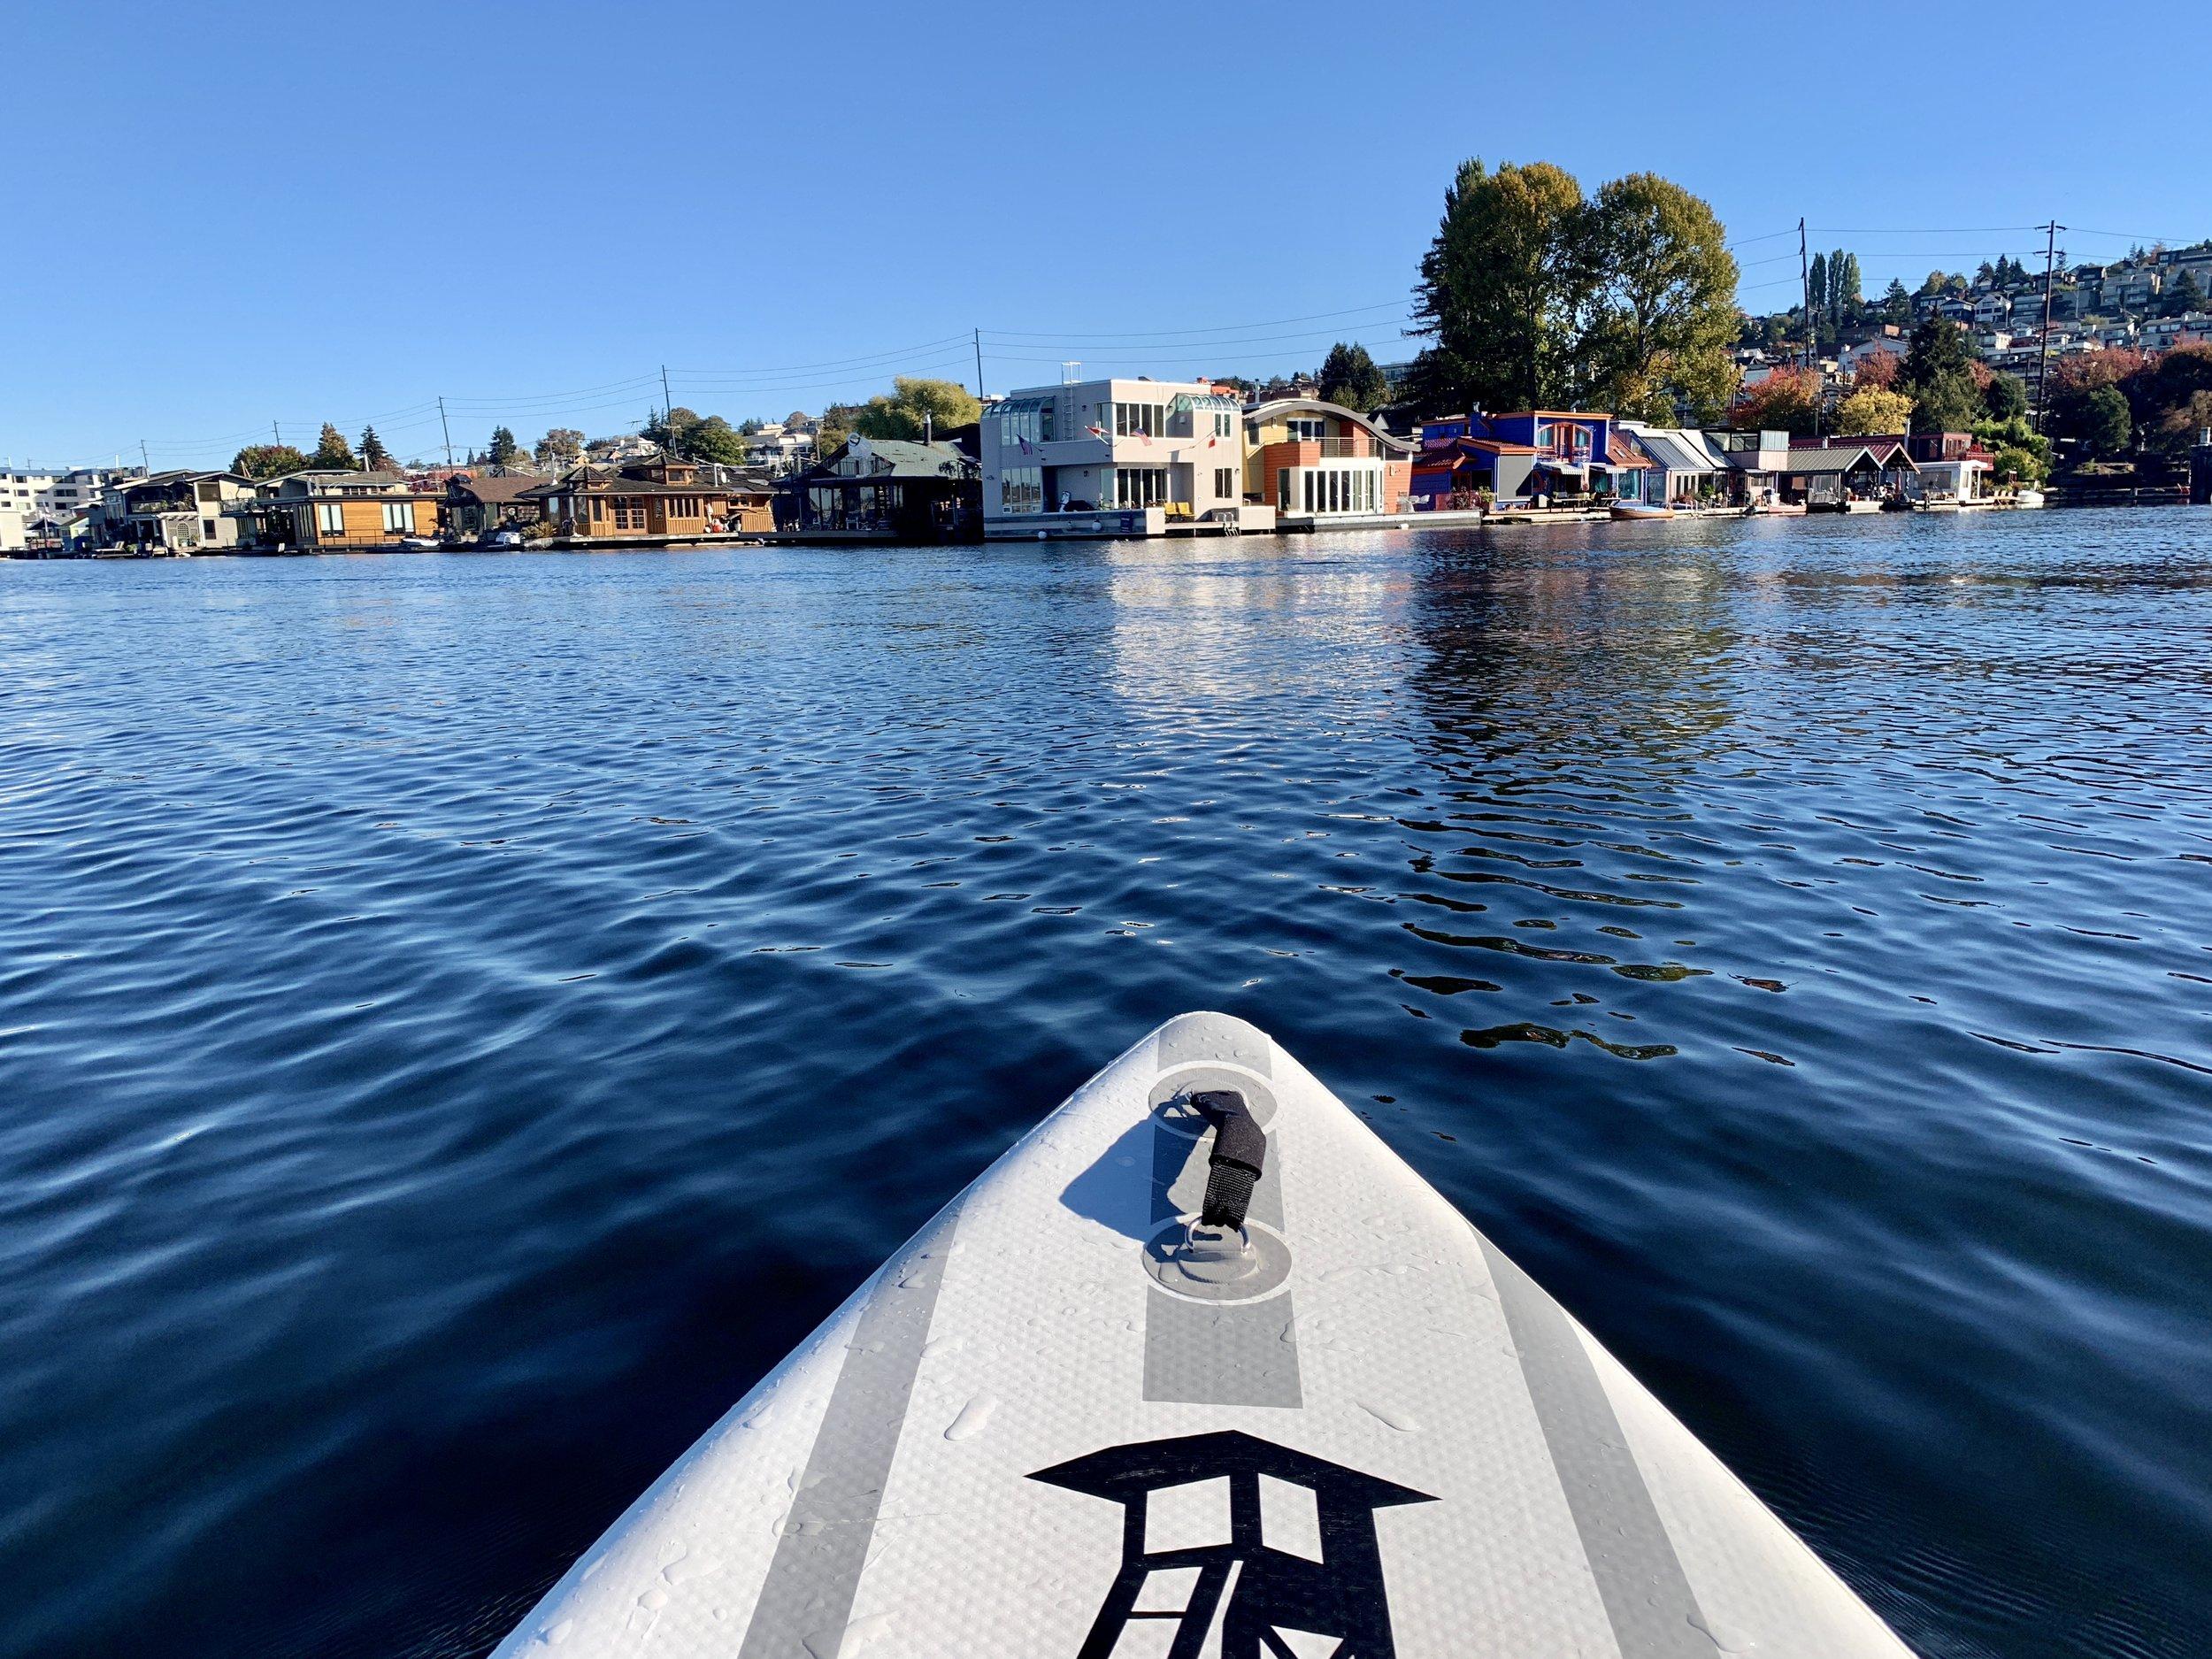 Paddling along the houseboats at Lake Union